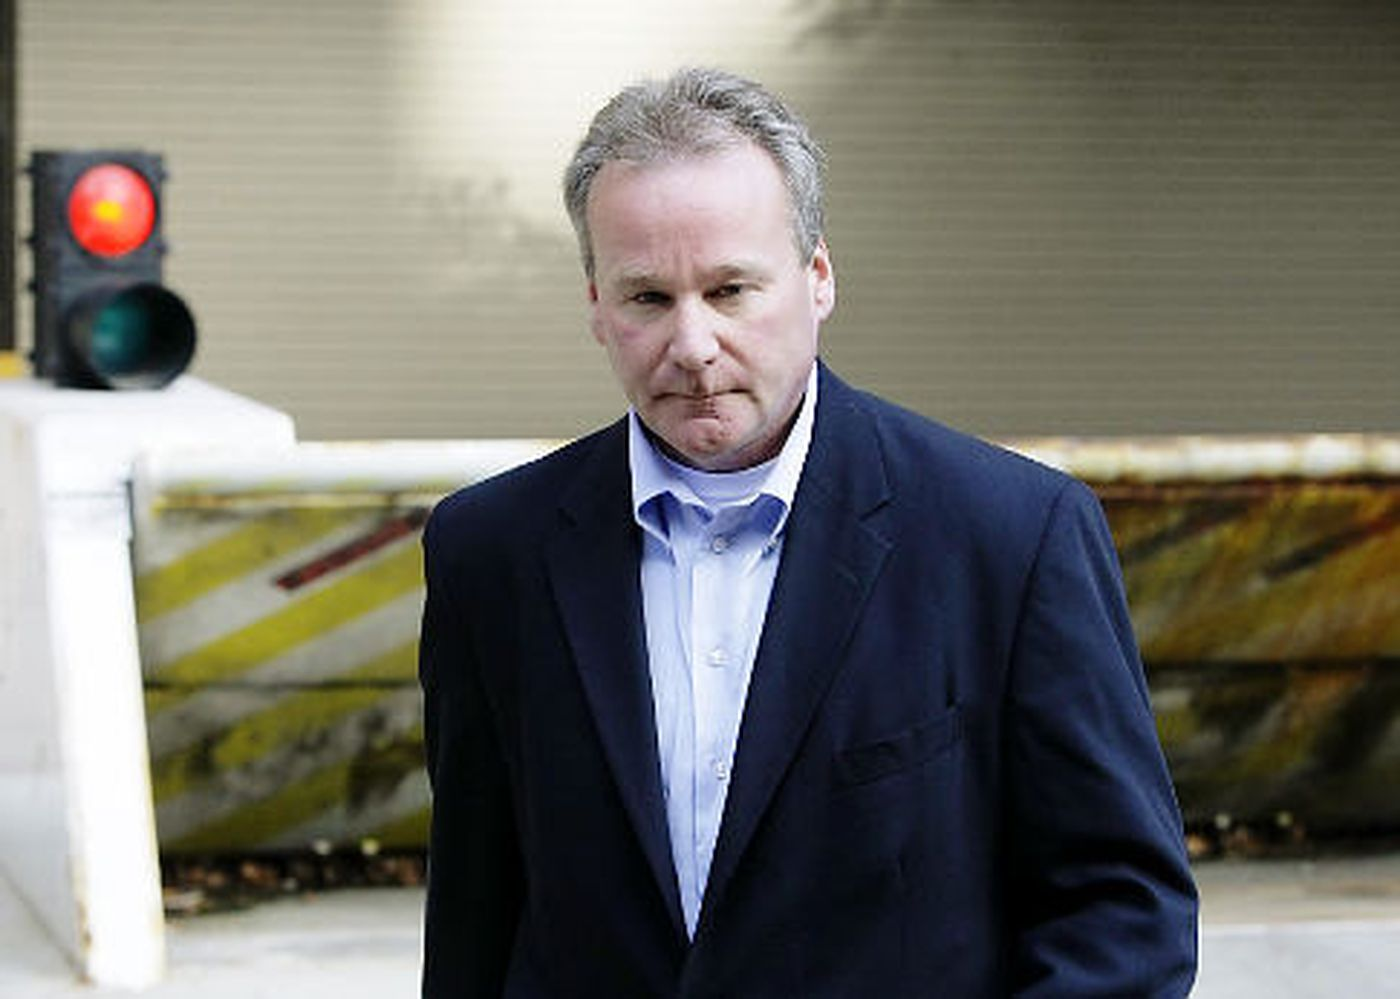 Michael David Jarret, who stalked Erin Andrews in the Marriott hotel